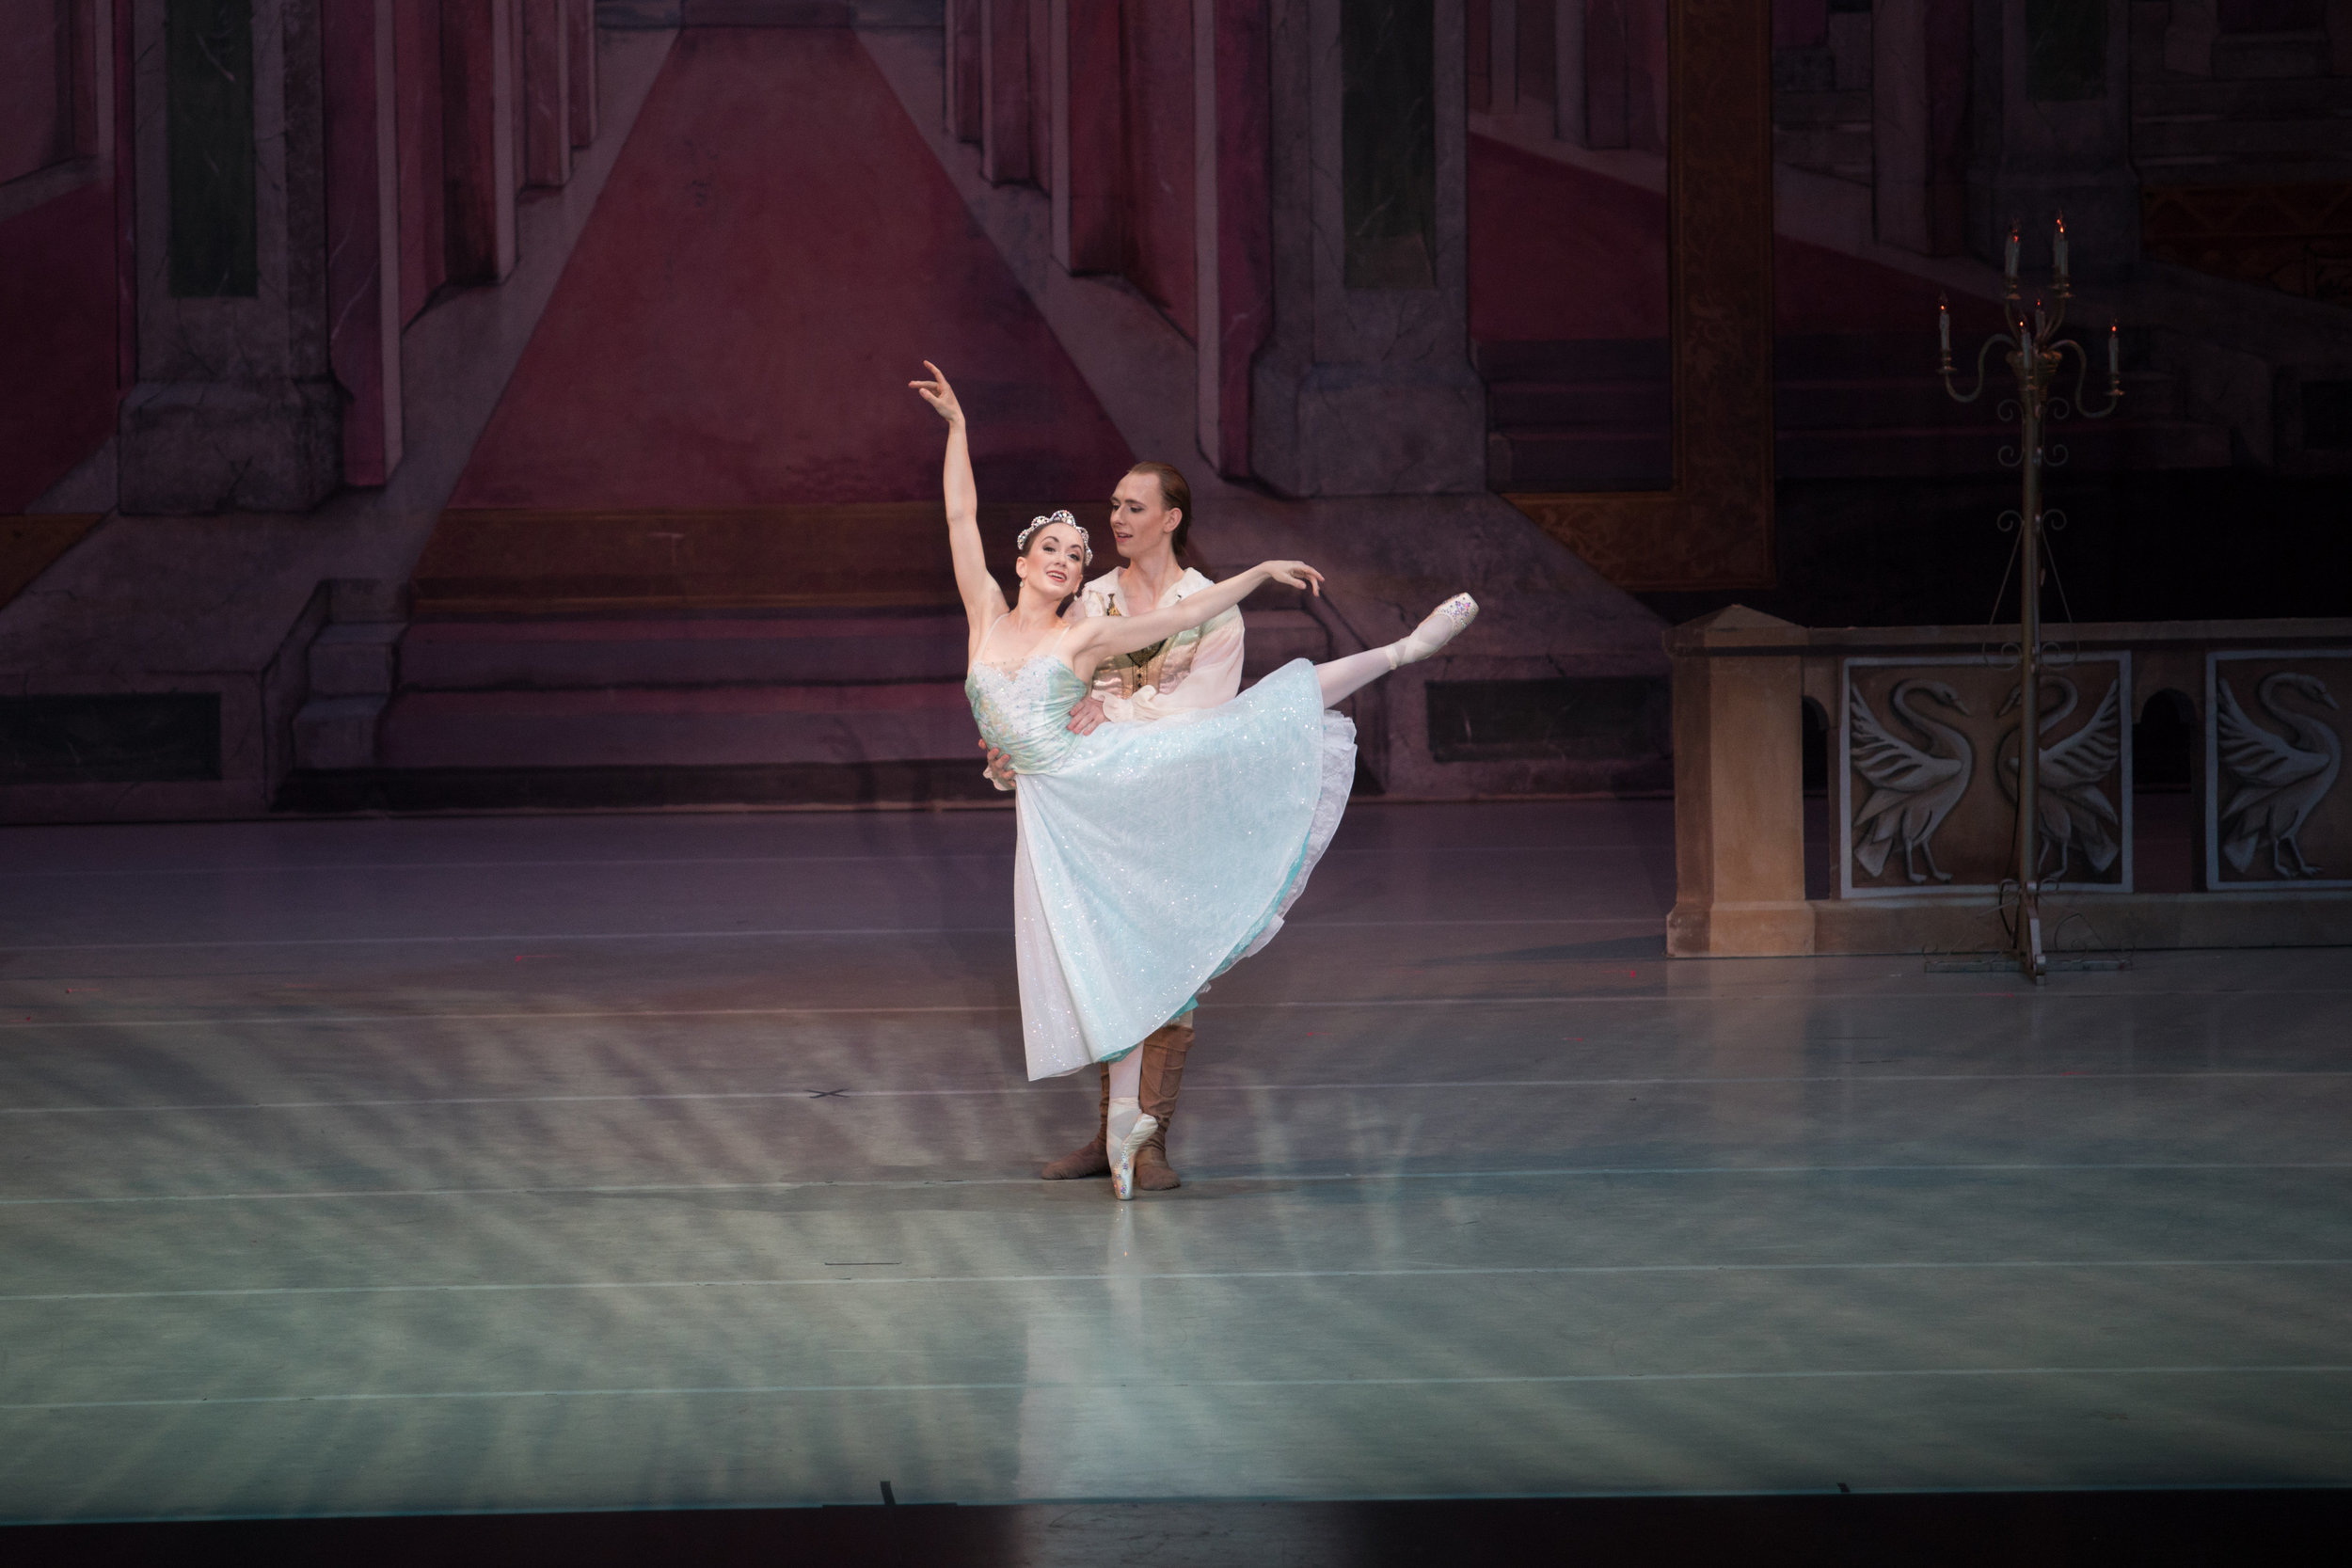 2018 Ballet Des Moines Cinderella Evening Performance-Performance 2 Fi-0211.jpg